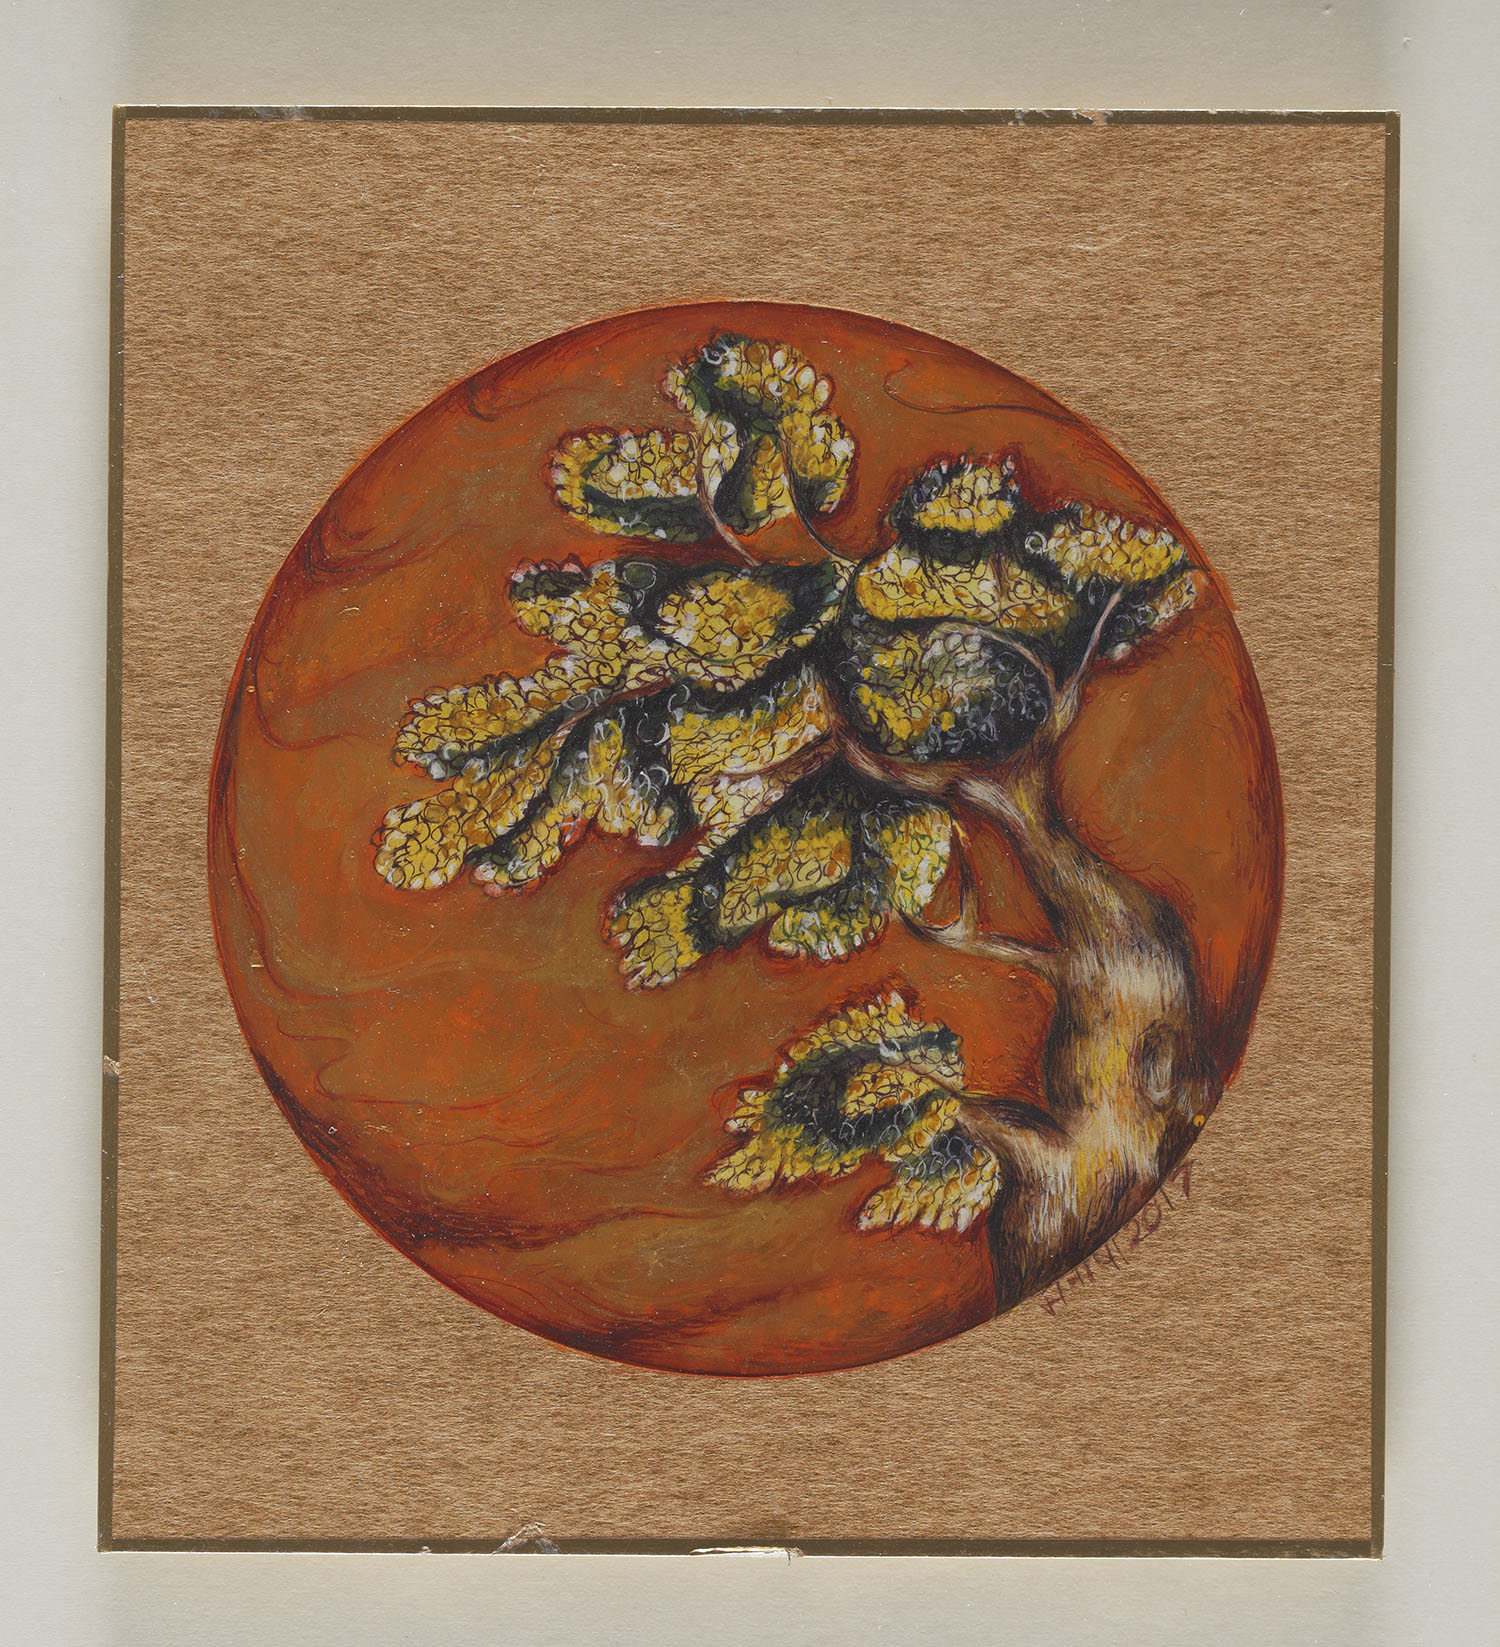 The Many Shades of Manisha Gera Baswani - Contemporary Art, Manisha Gera Baswani, This Just In